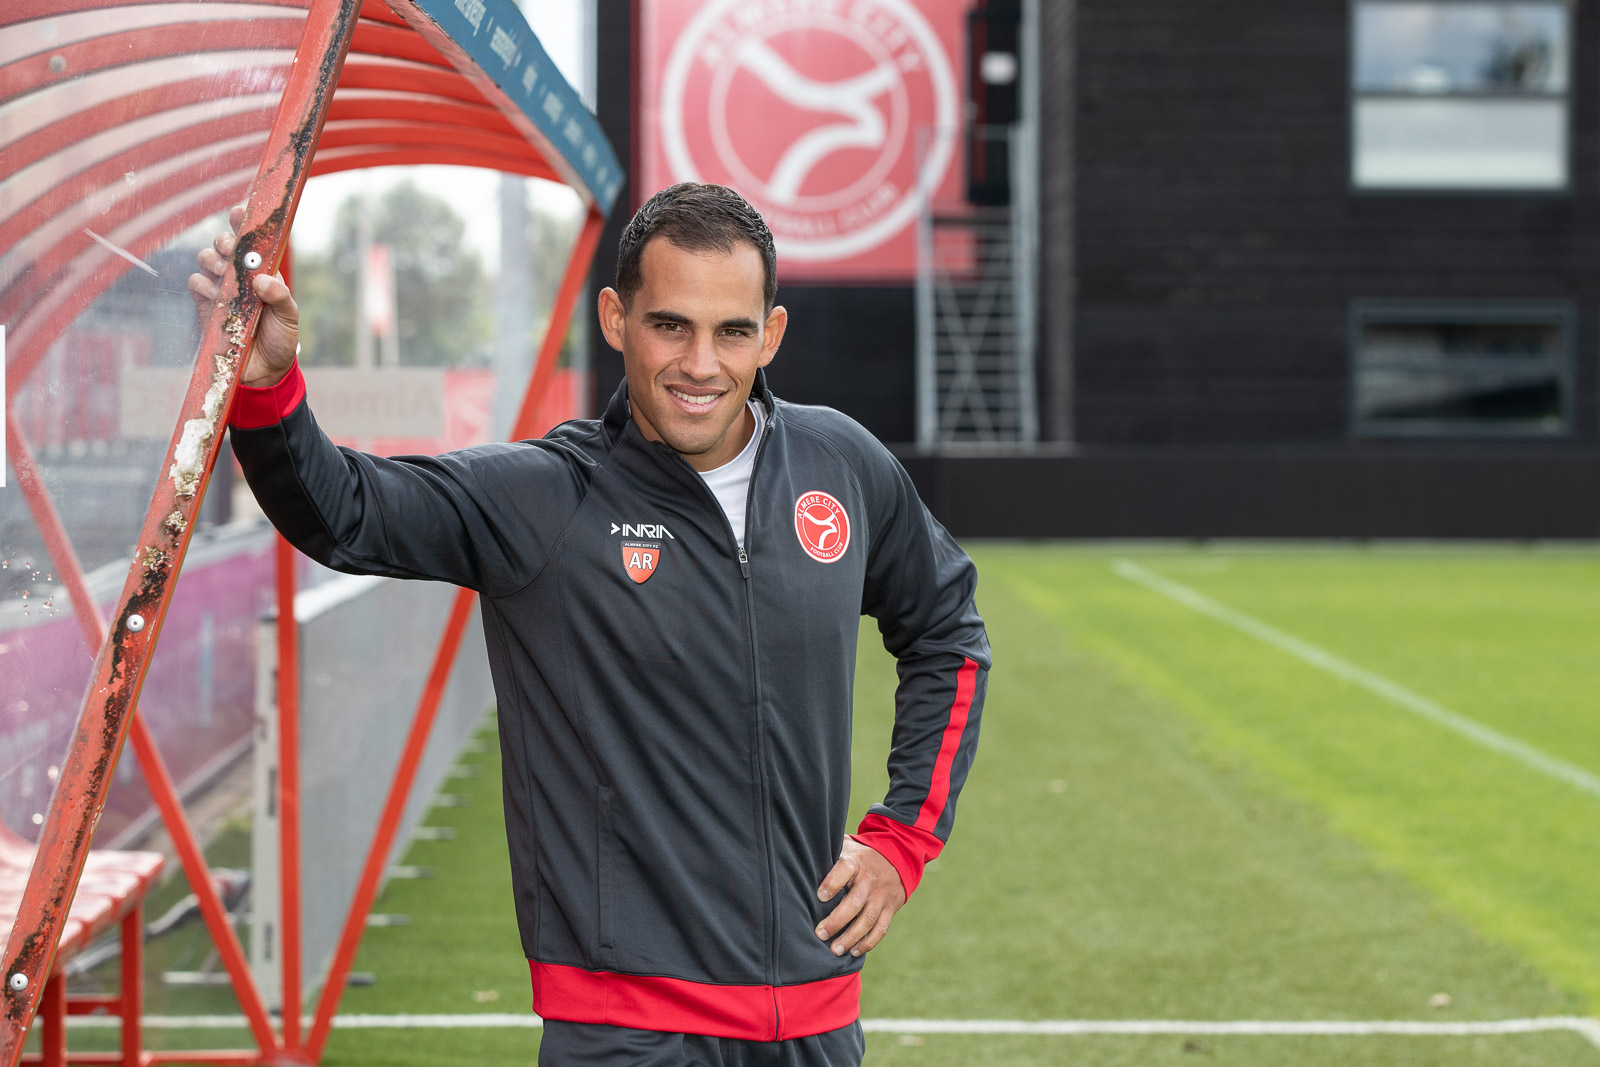 Jong Almere City FC wil eerherstel na klap